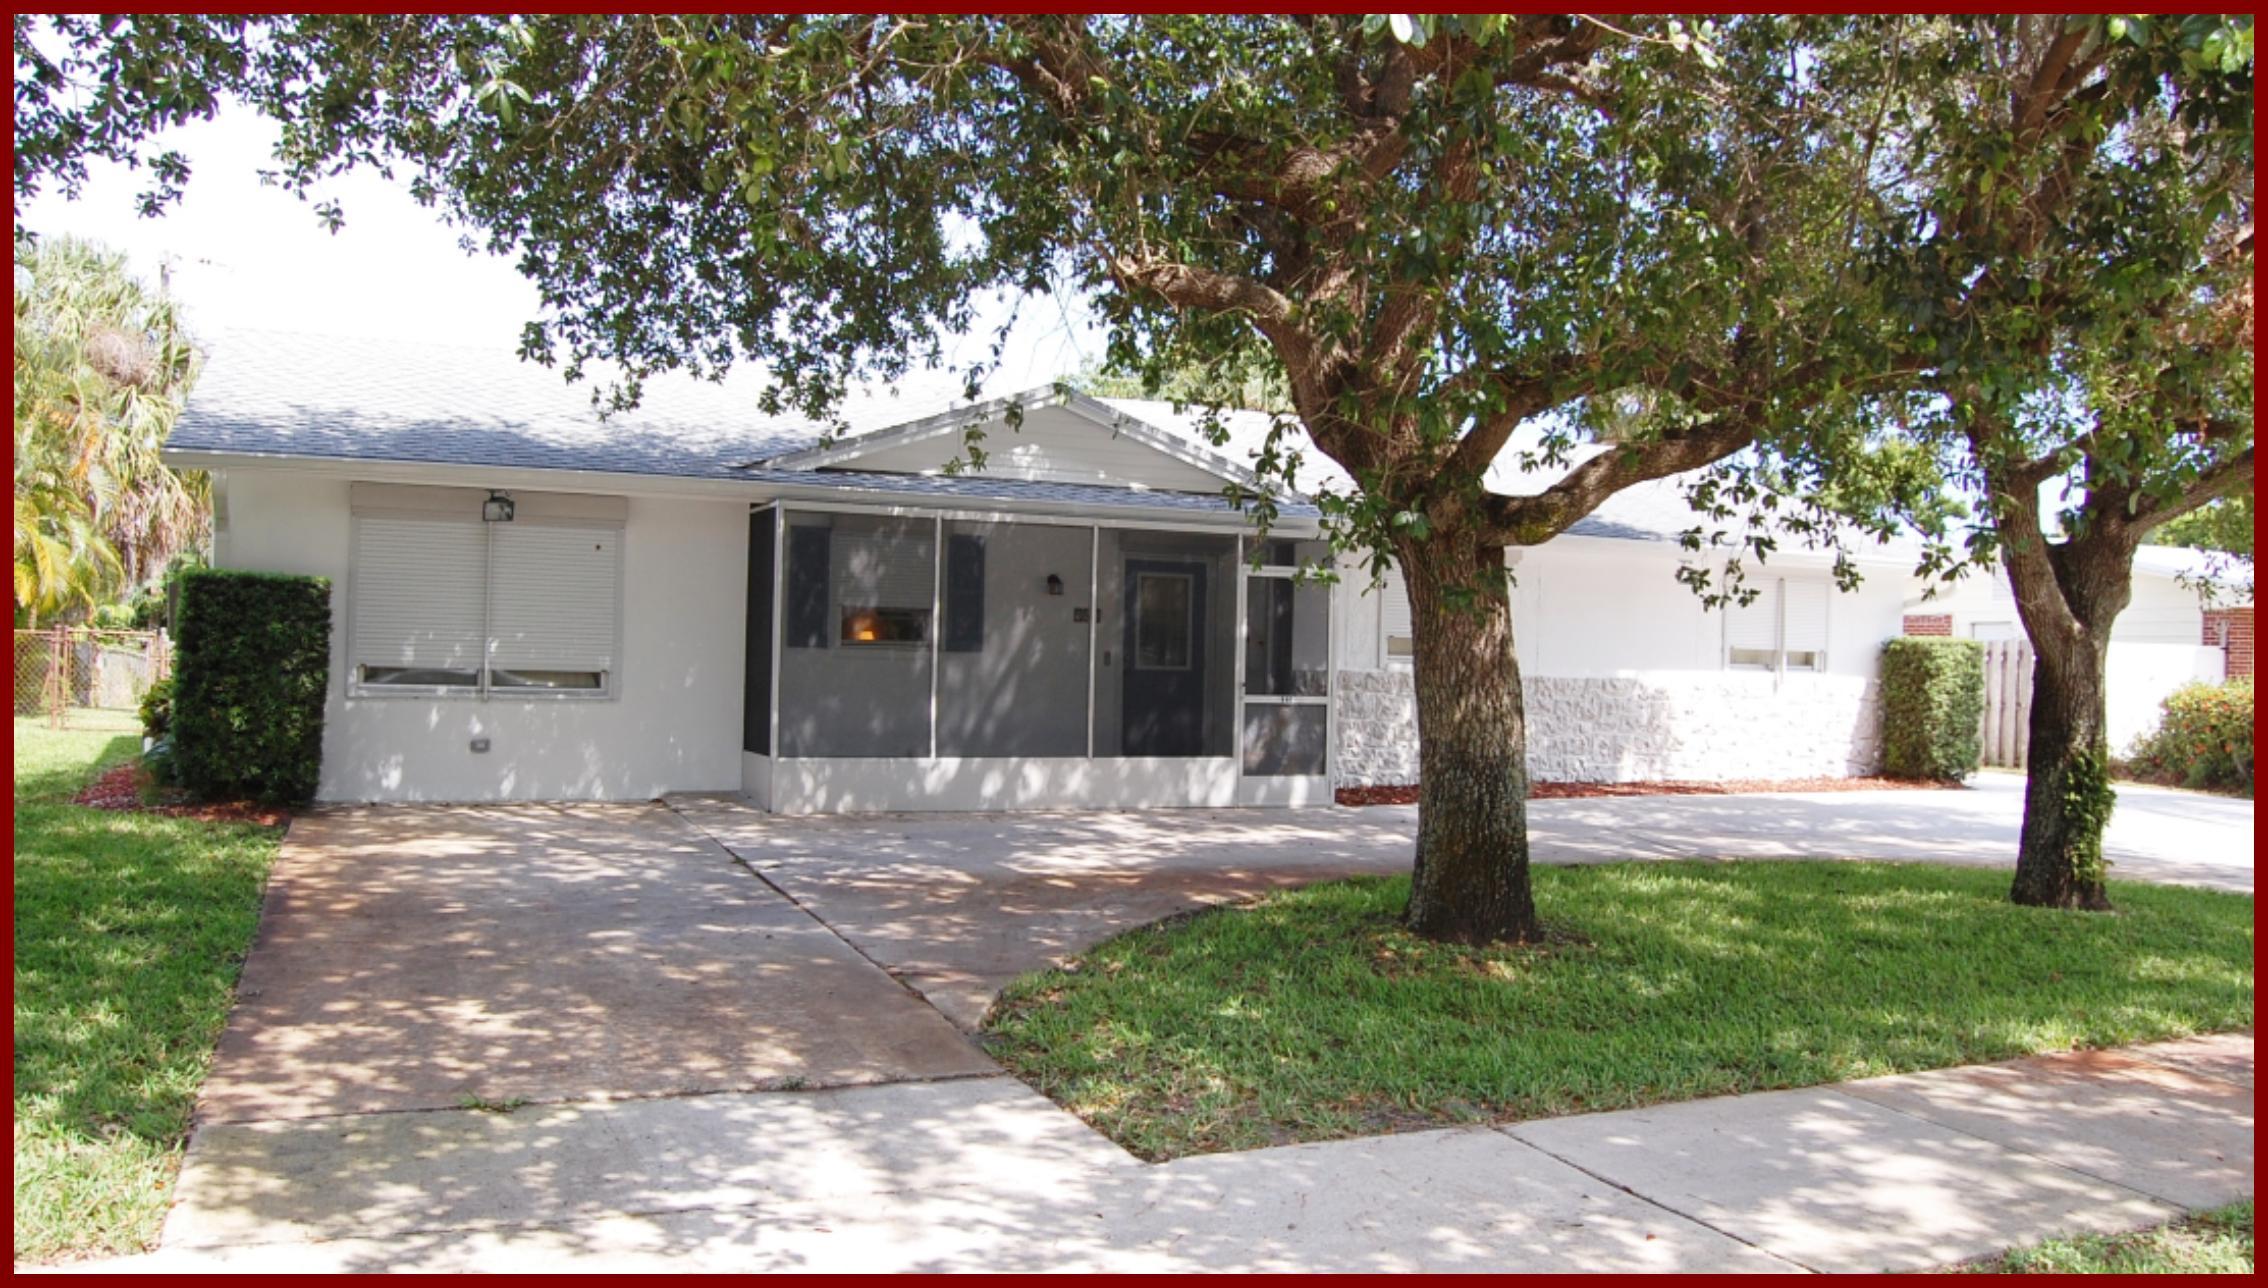 Photo of 940 Prosperity Farms Road, North Palm Beach, FL 33408